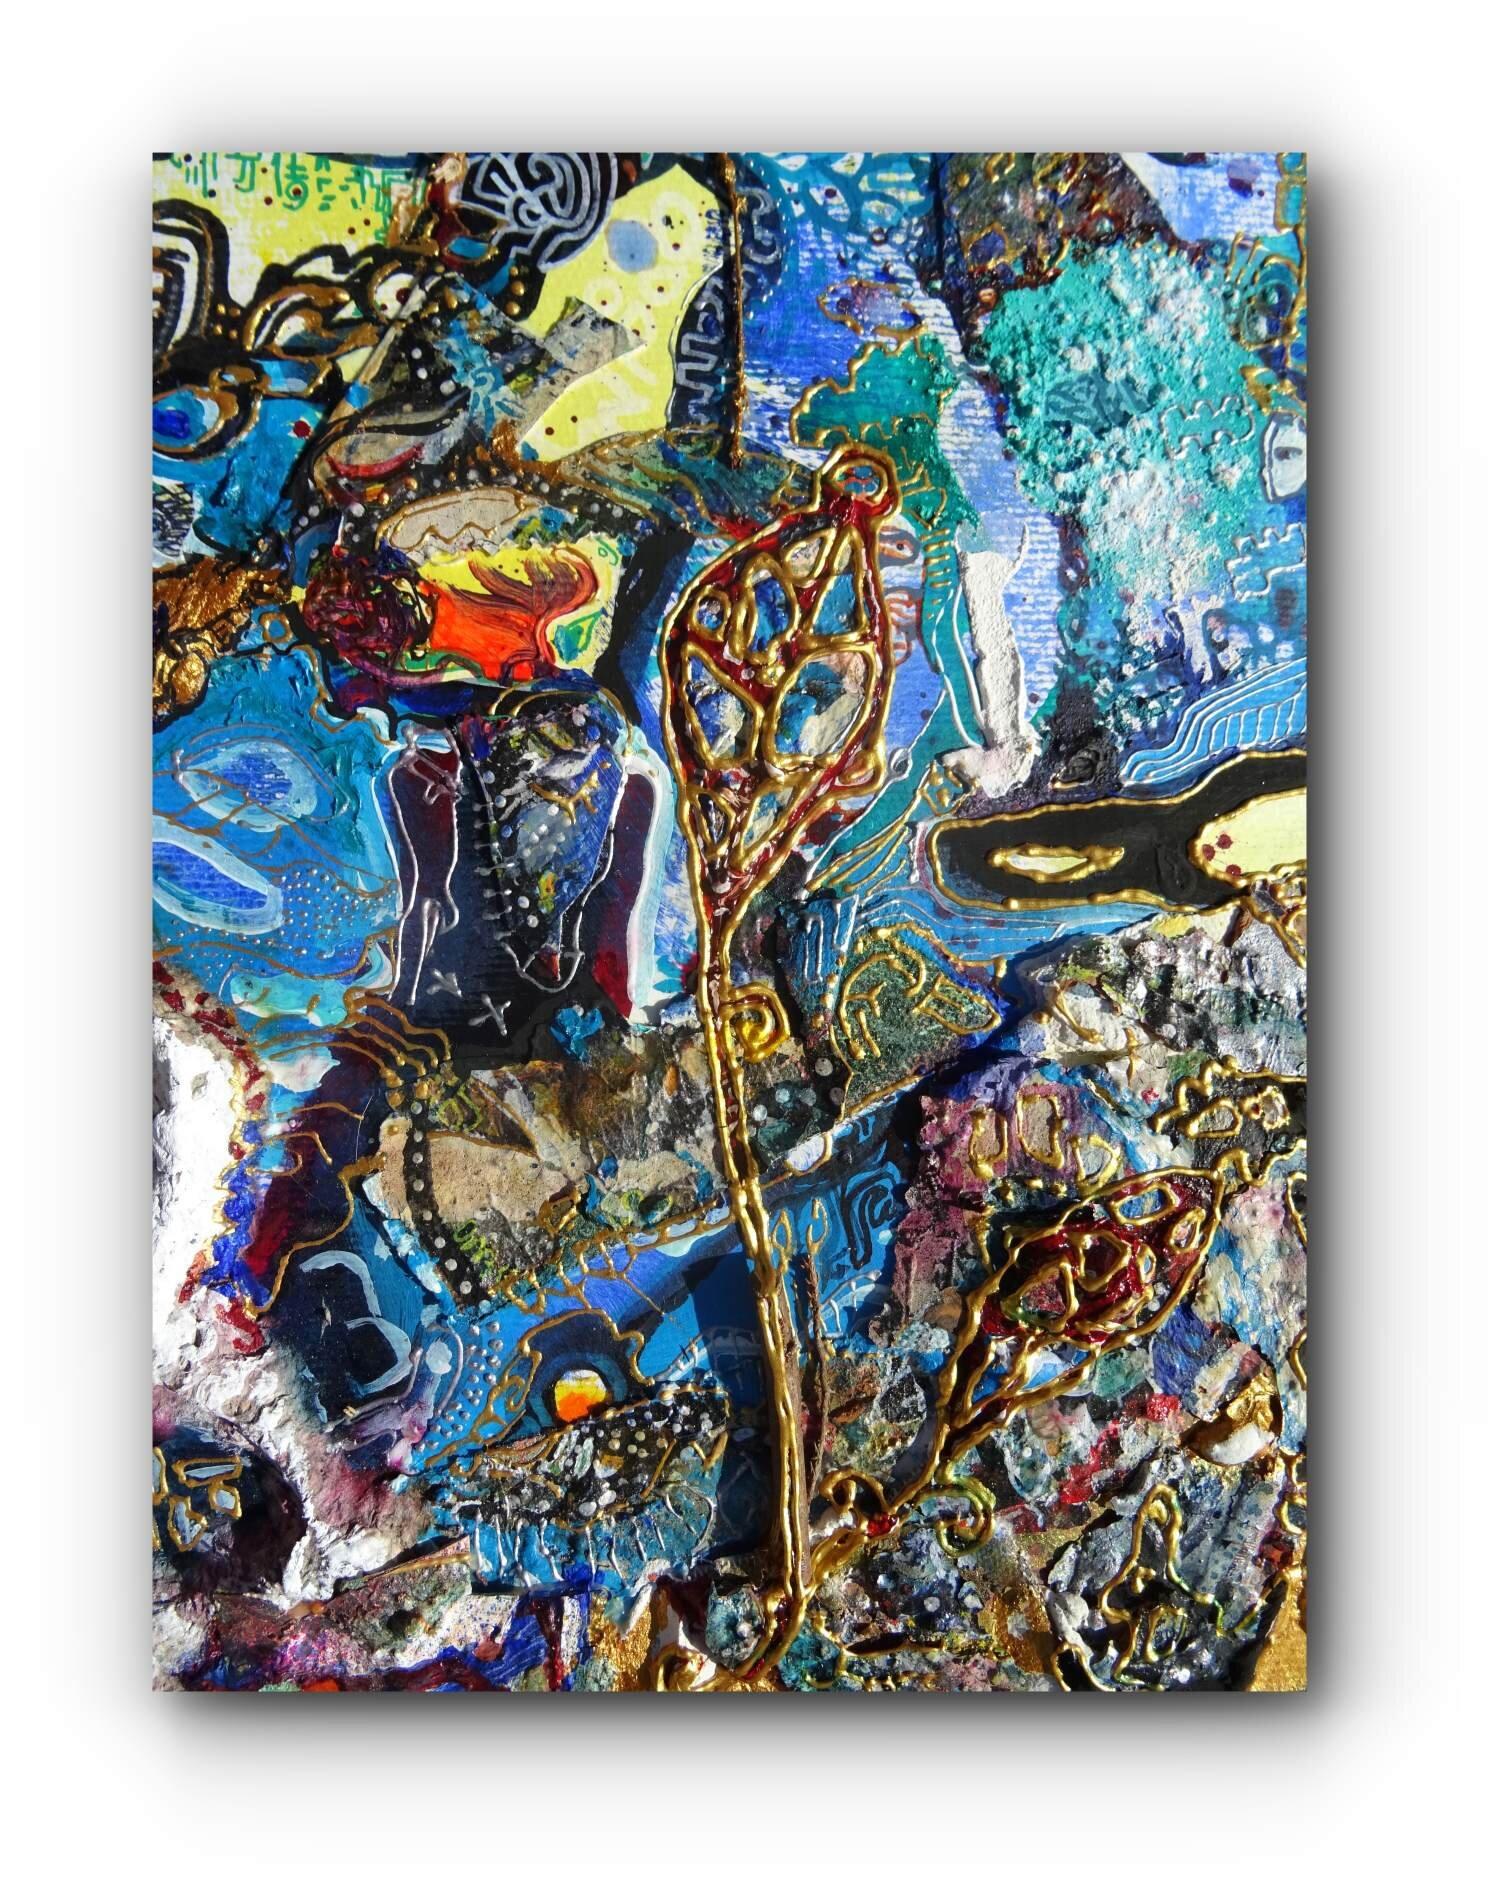 painting-celestial-summit-d3-artist-duo-ingress-vortices.jpg